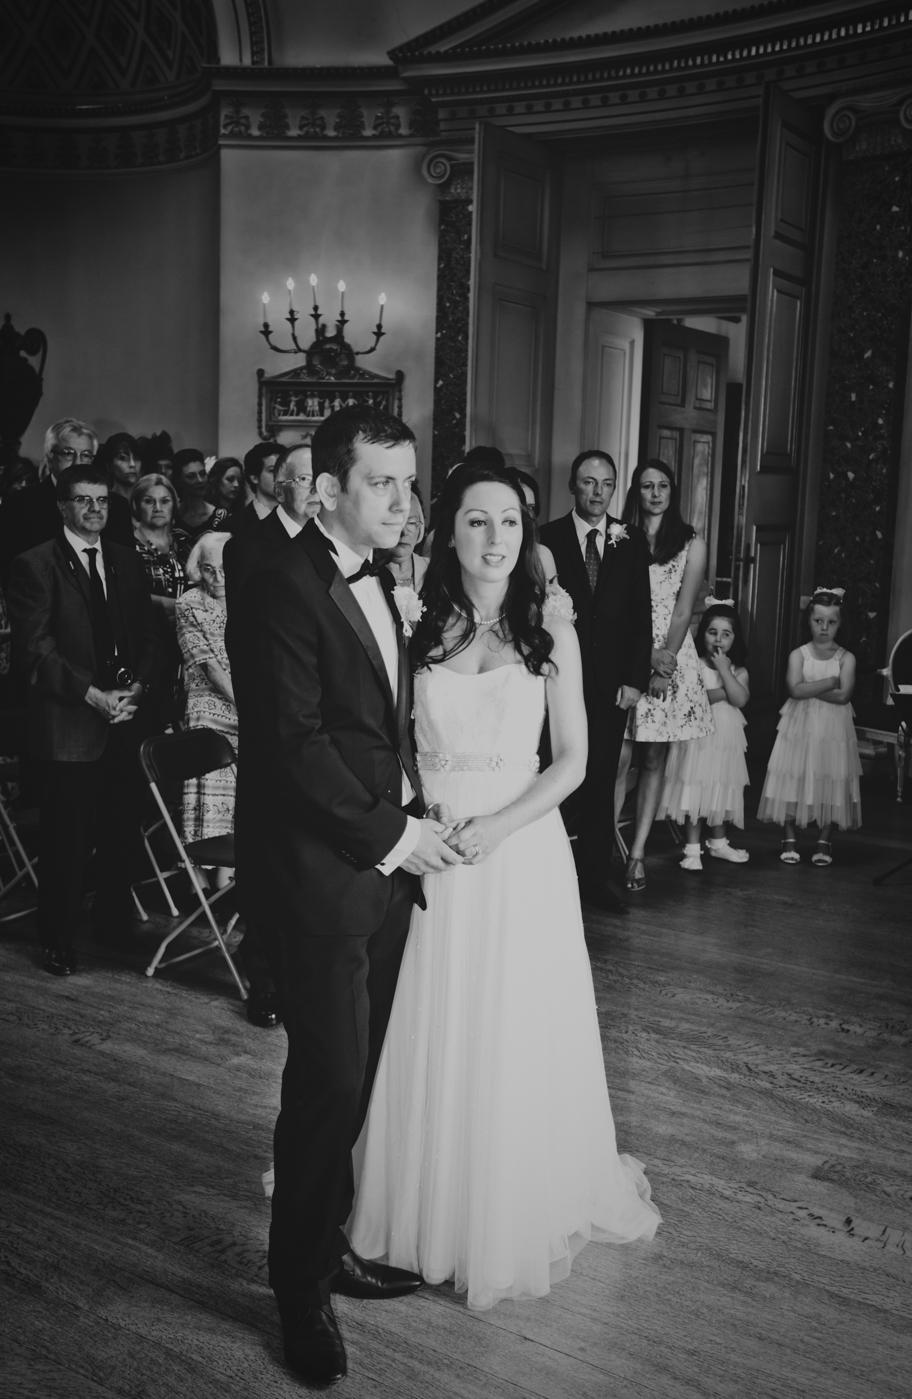 065 - Abi and Chris at Kedleston Hall - Wedding Photography by Mark Pugh www.markpugh.com - 0178.JPG